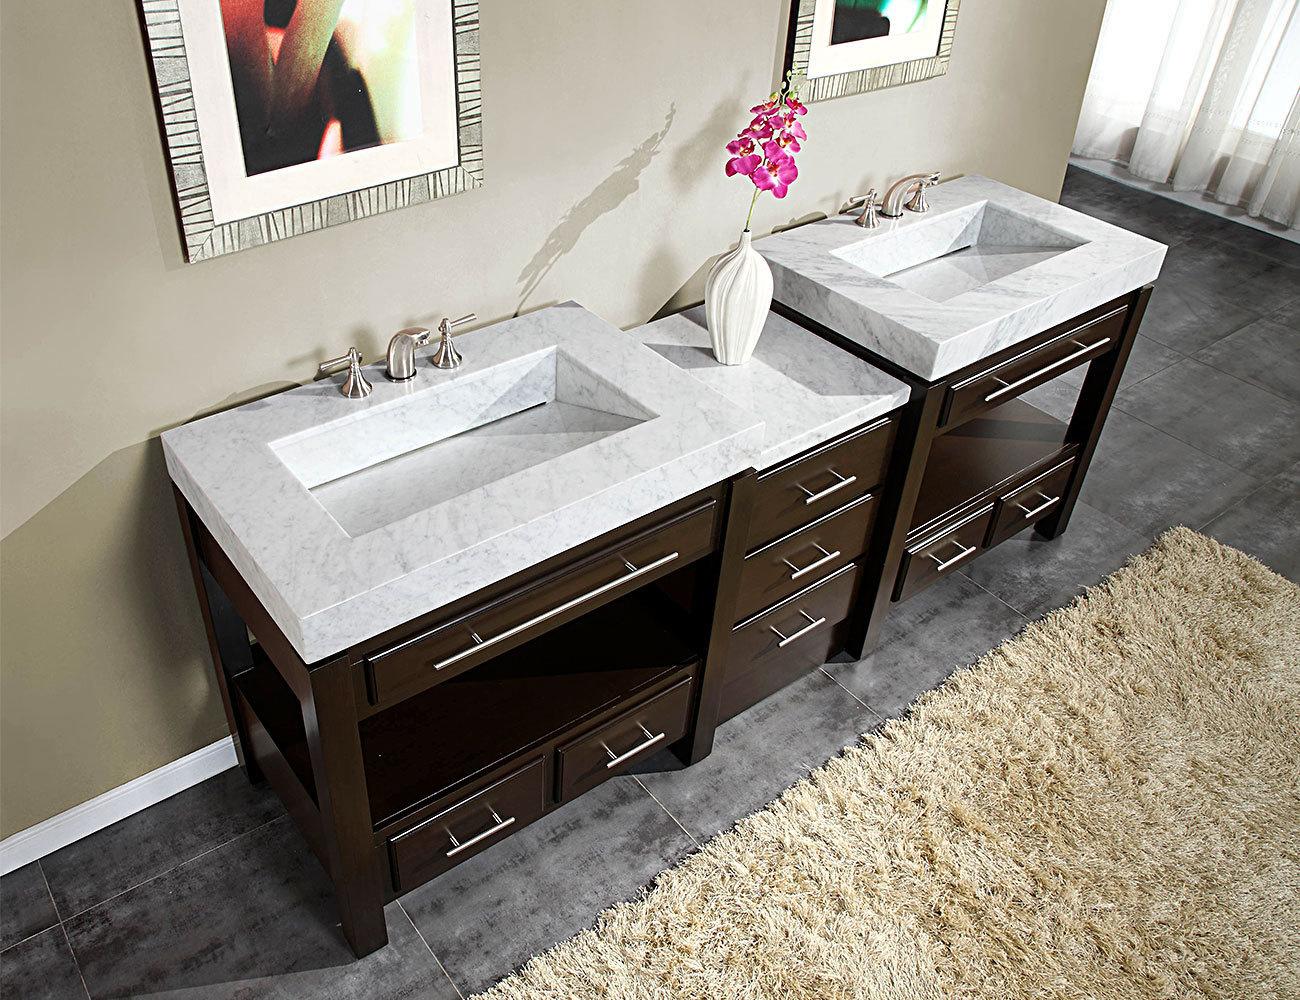 Silkroad 92 Moduler Bathroom Vanity Espresso Finish With White Carrara Marble Top